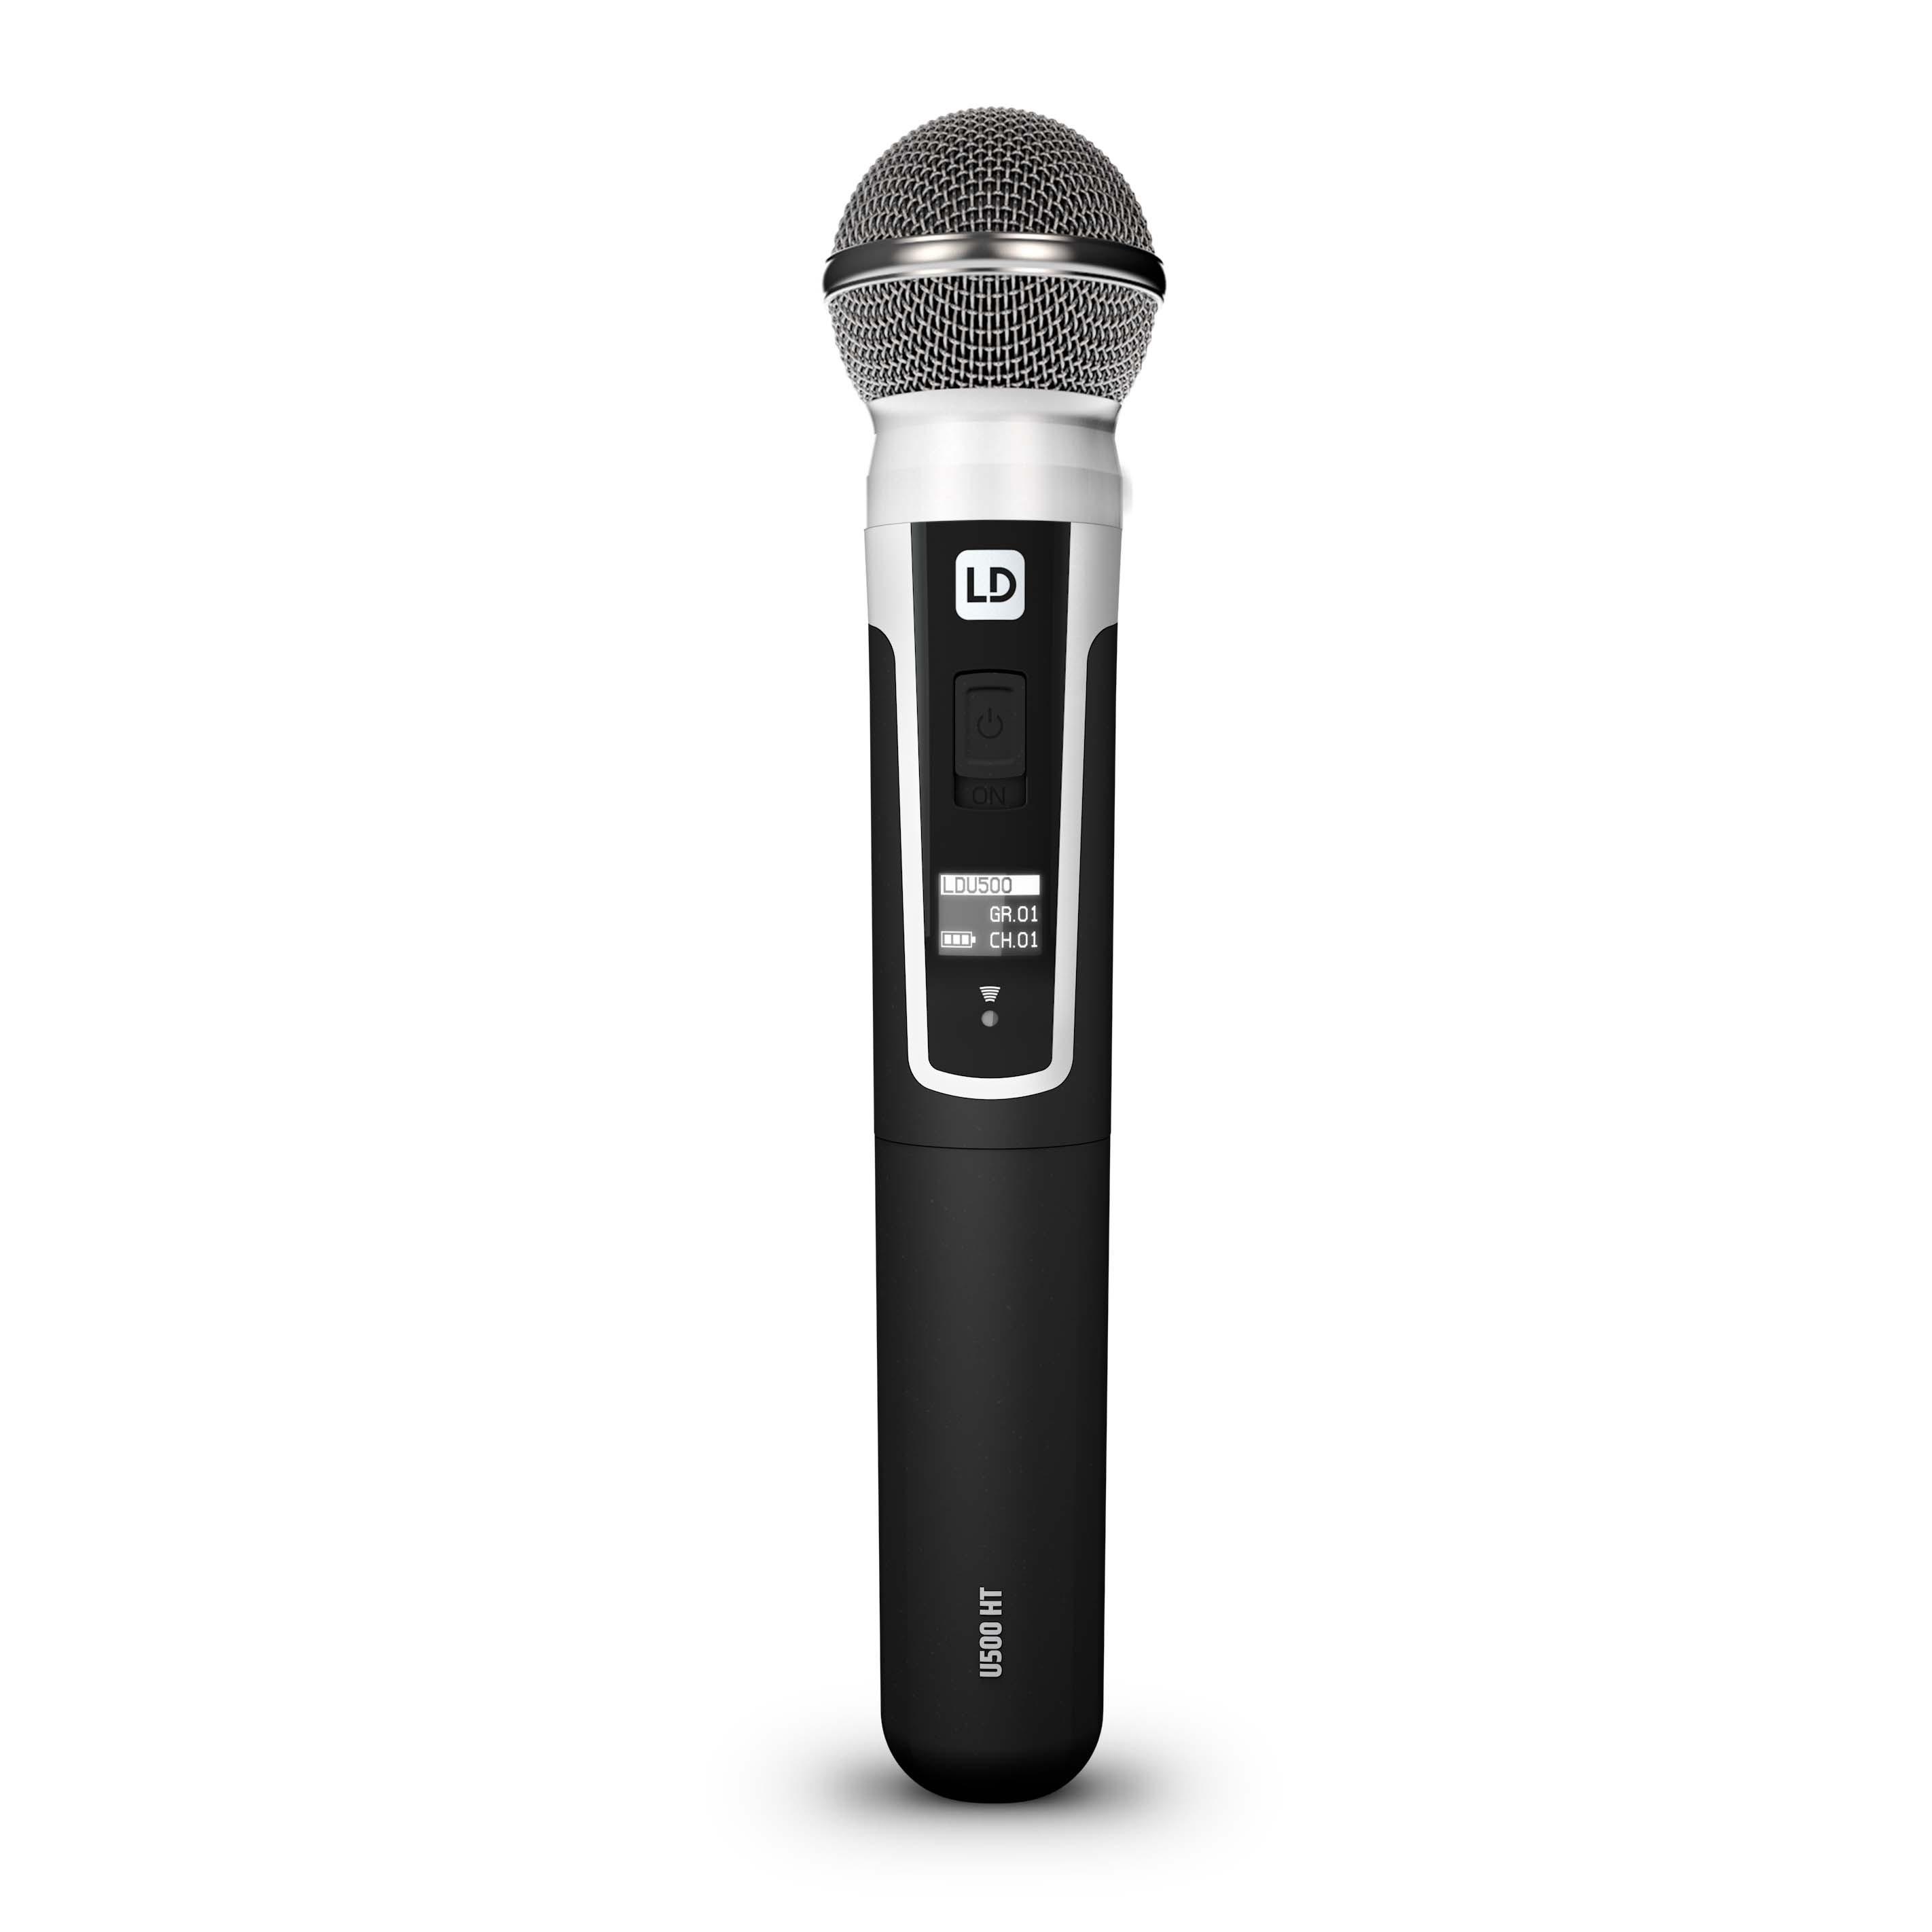 U518 HHD Funkmikrofon System mit Handmikrofon dynamisch